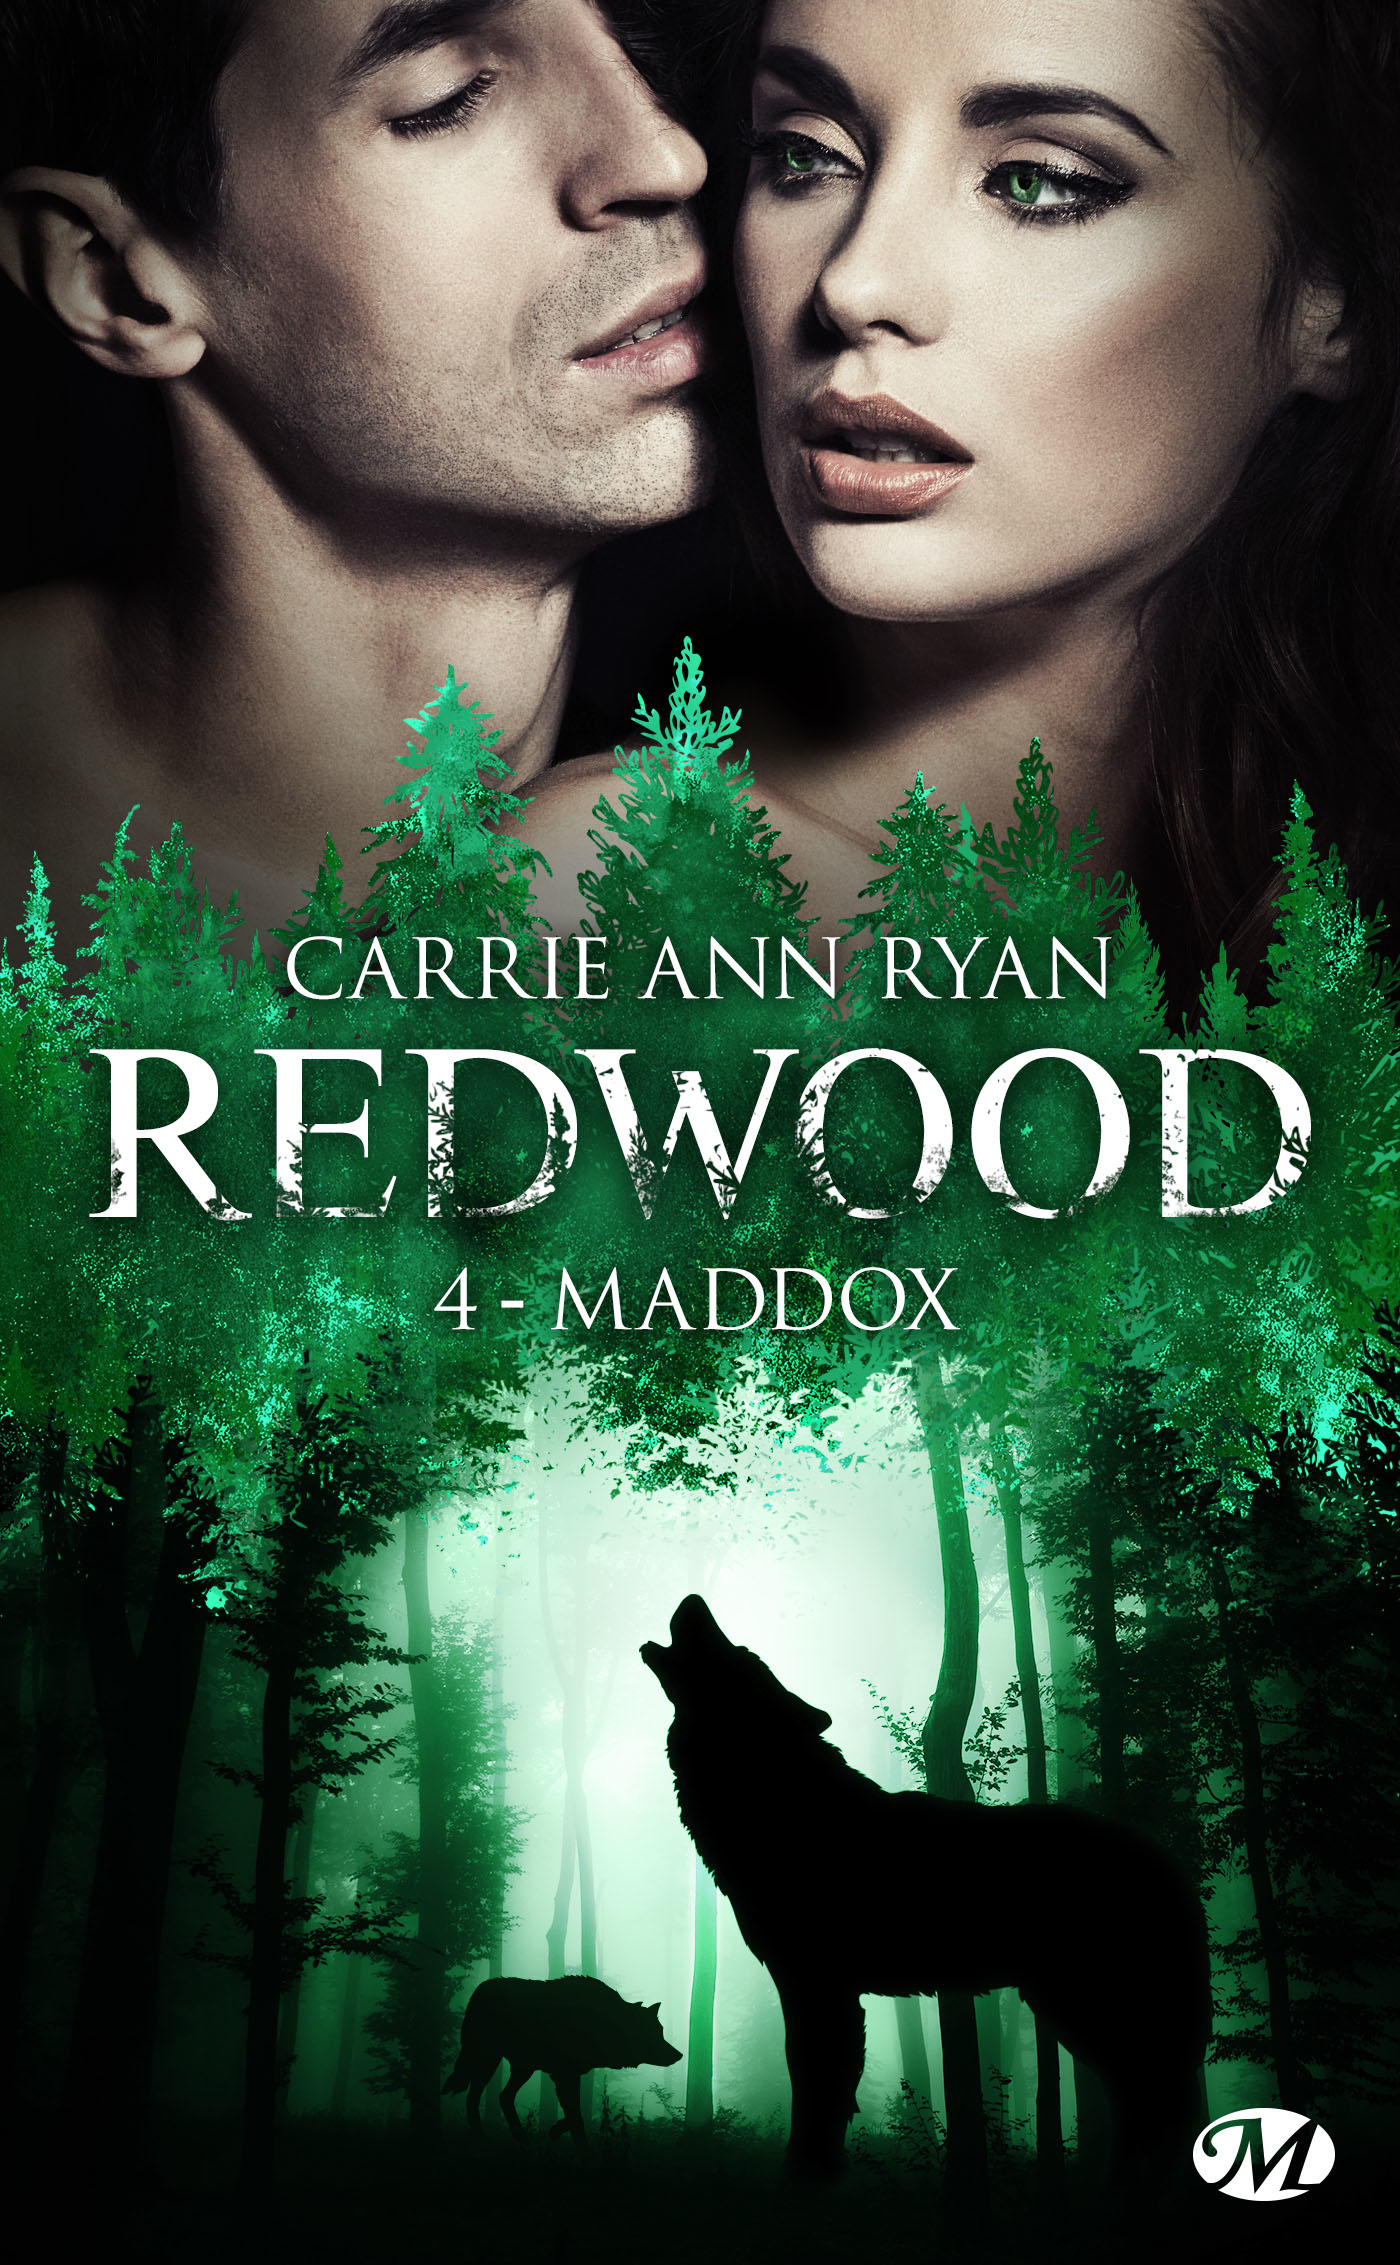 cdn1.booknode.com/book_cover/1225/full/redwood-tome-4-maddox-1225275.jpg